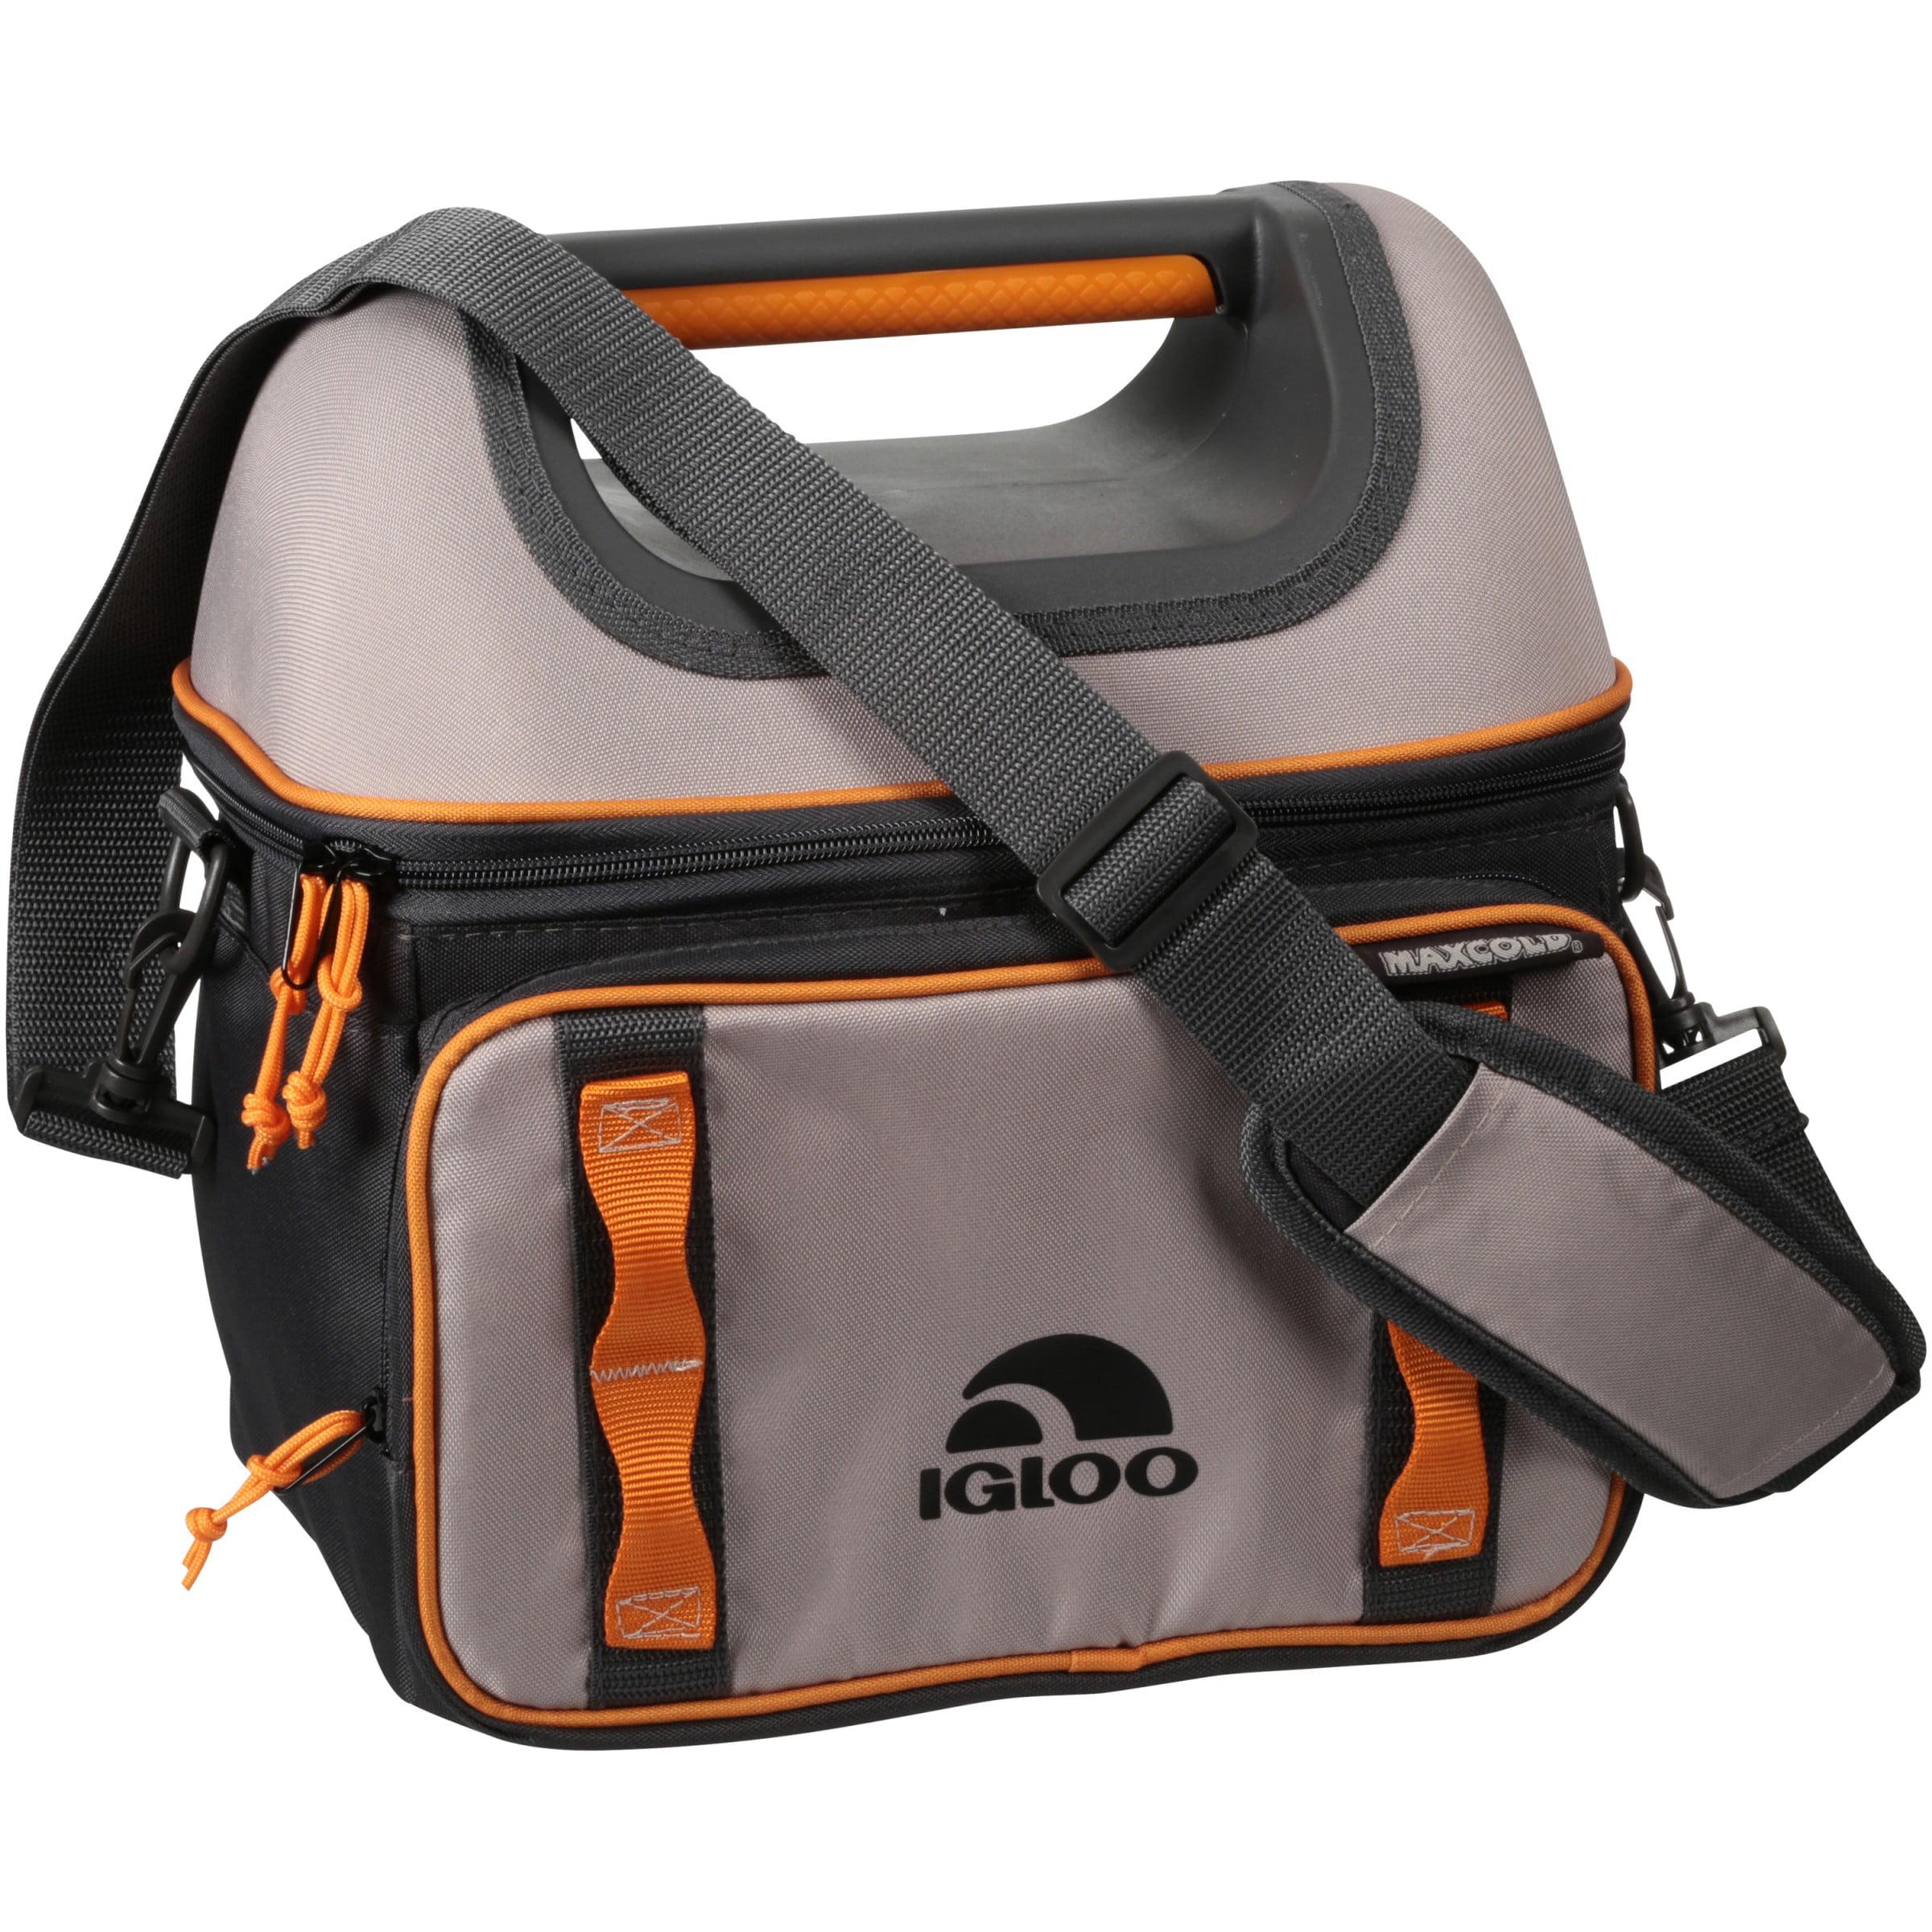 Igloo® Hard Top Playmate® Gripper™ 22 Tan/Orange Cooler Bag